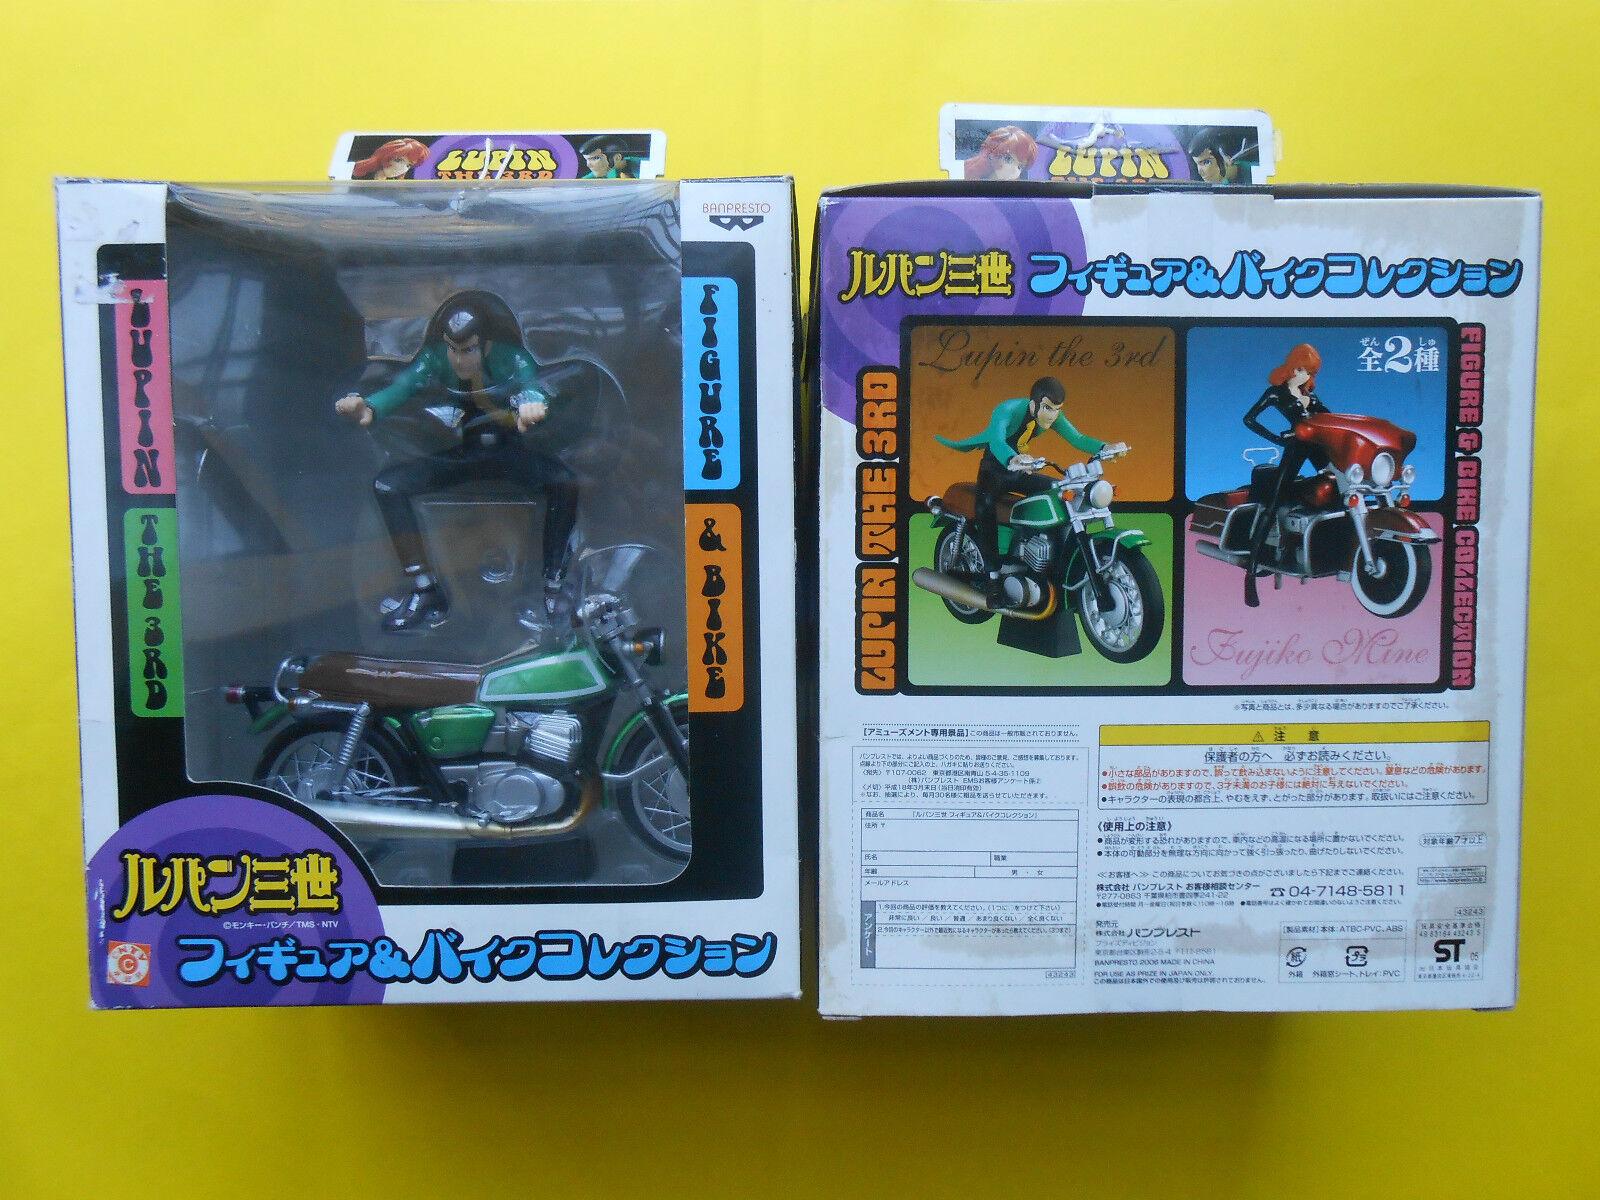 Rare box lupin & model bike figure pvc lupin III vert bike torutoru catcher dx